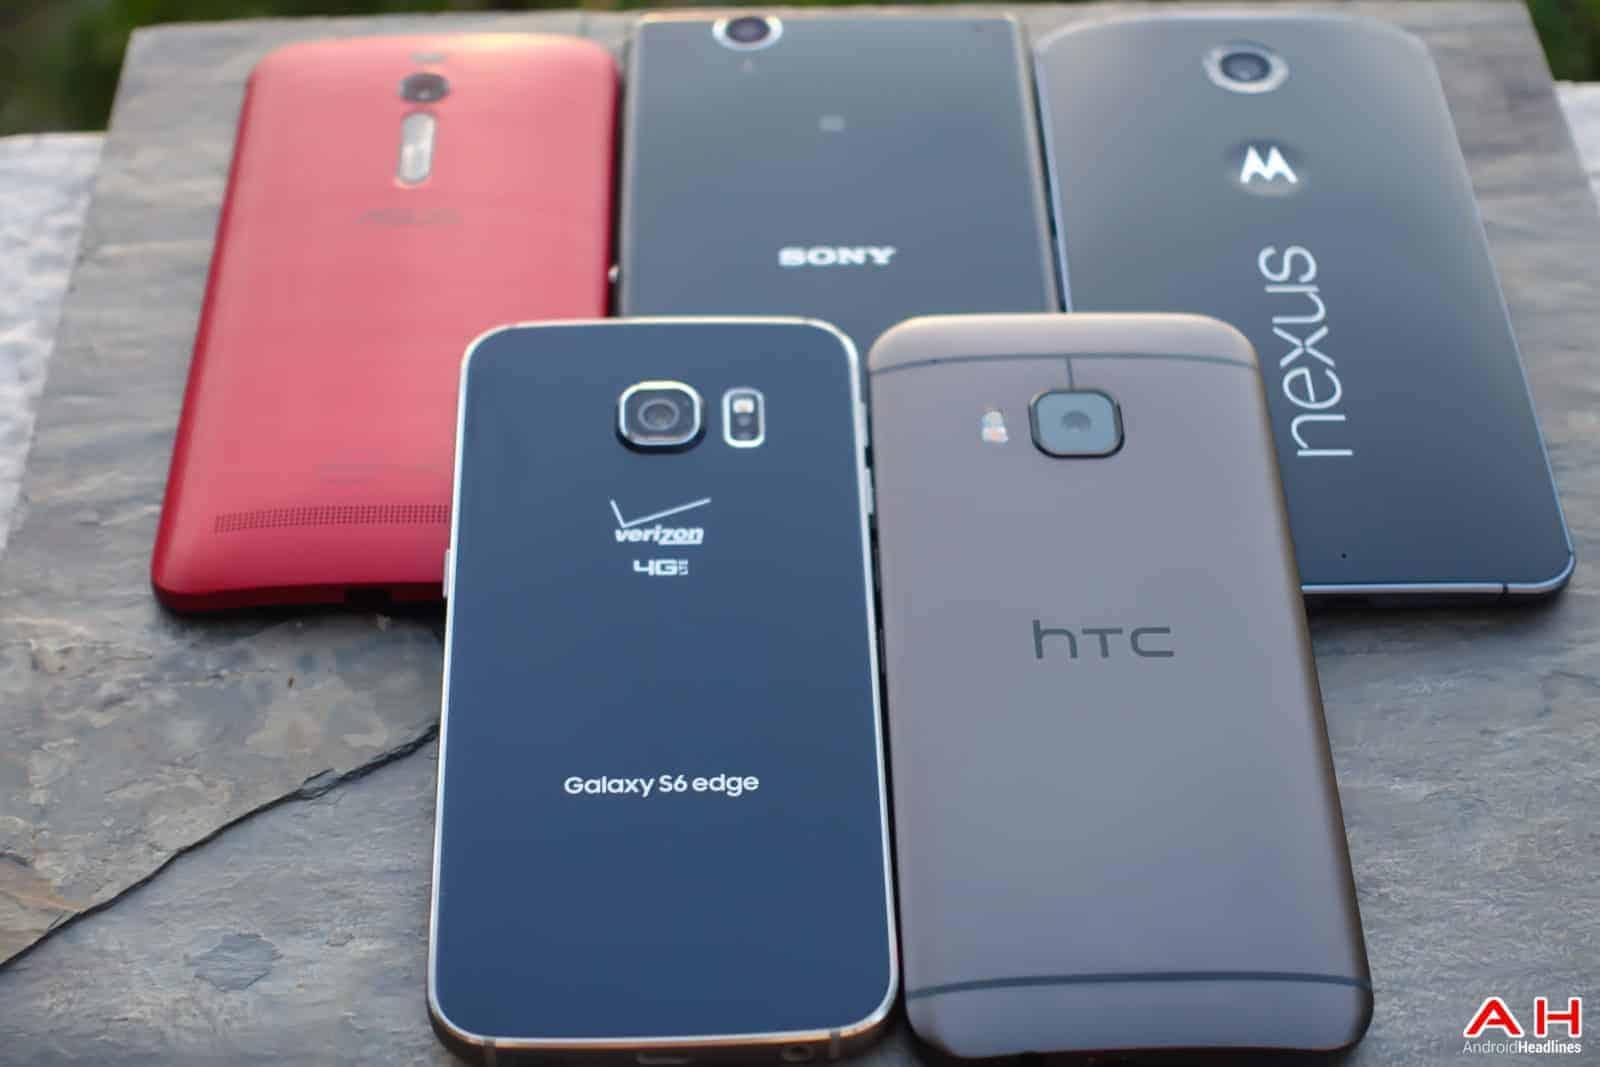 AH AH Android Samrtphones Nexus Samsung Galaxy S6 HTC One M9 Sony OEM logos-21 May 3rd Batch 2-4